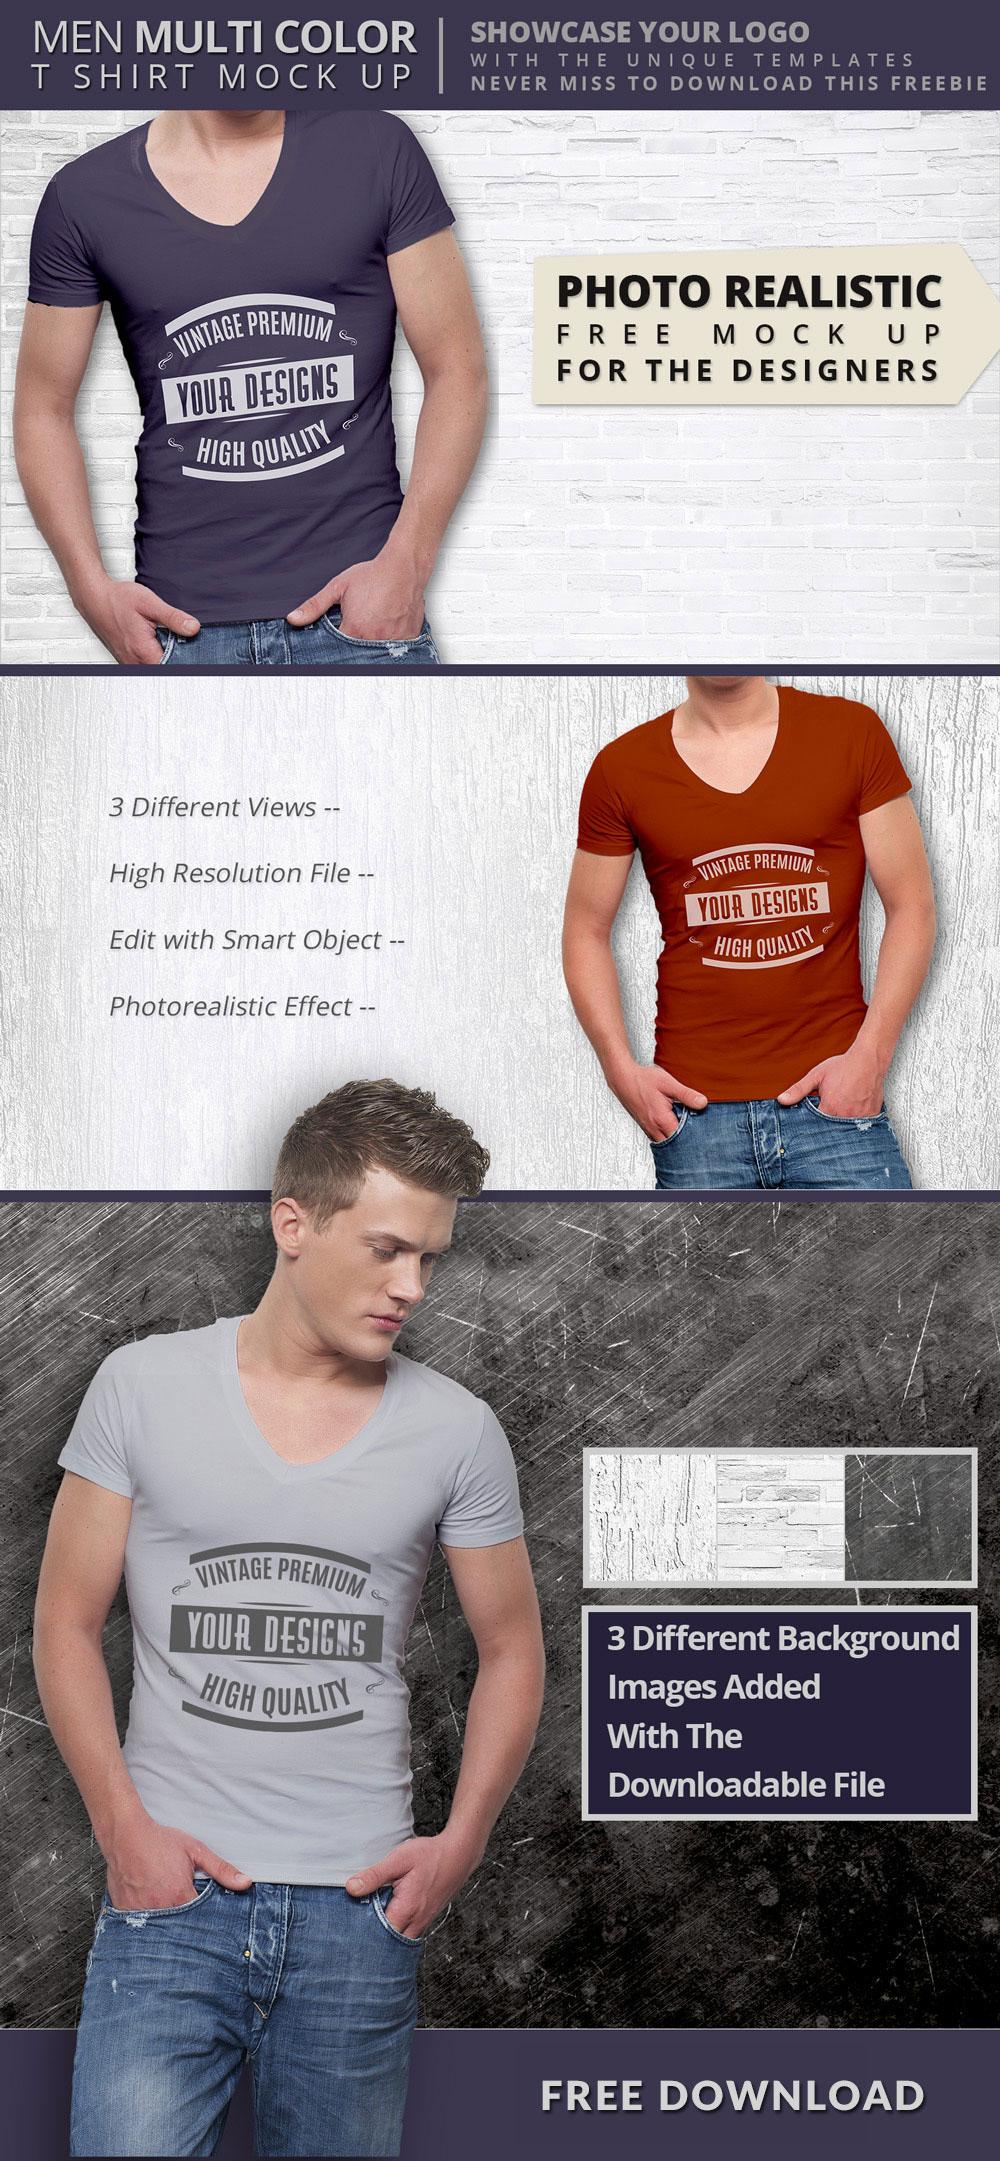 free mockup  t shirt mockup psd mockup mockup for designers mockup freebies